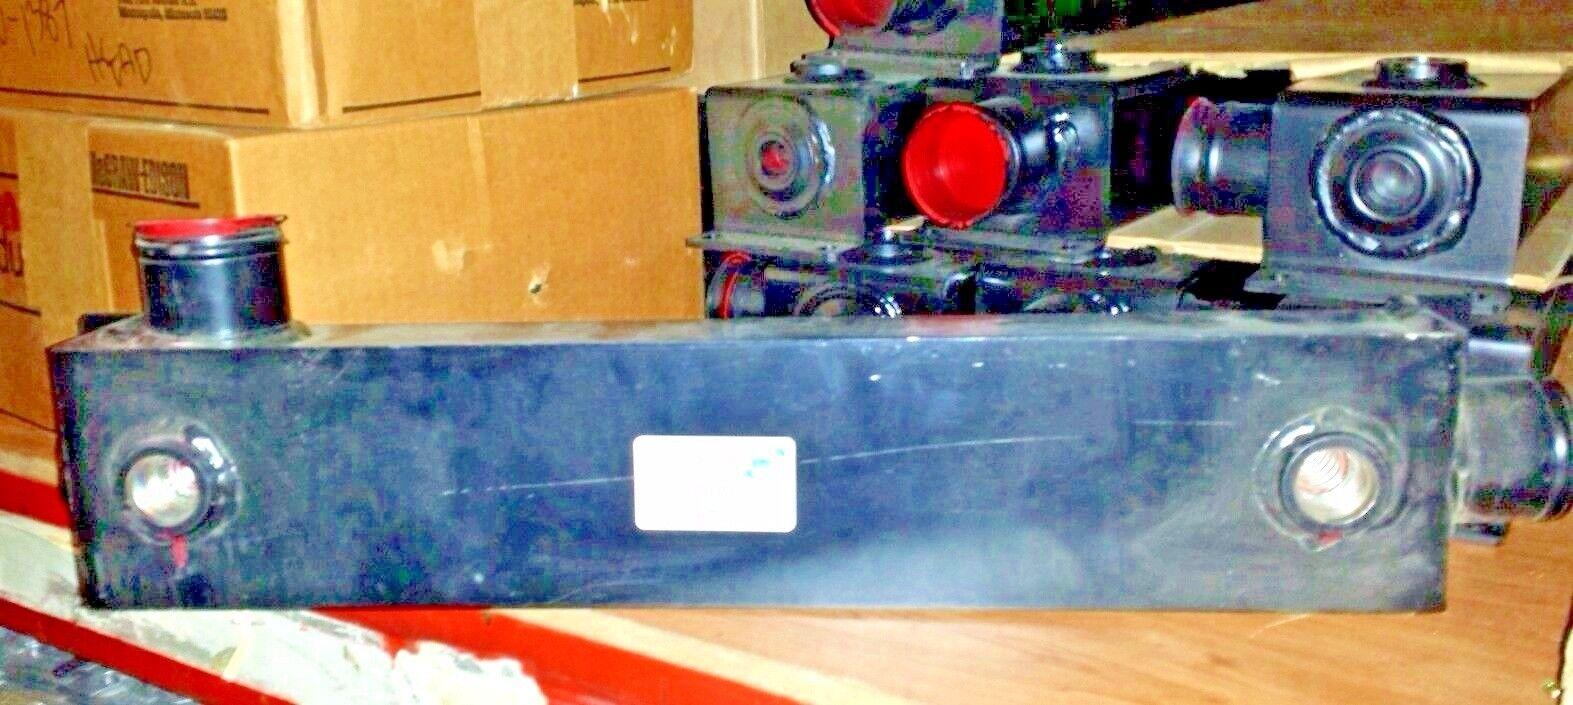 M1A20896 Modine transmission oil cooler radiator Monaco  RV 22 x 4.5 x 3.25  NEW